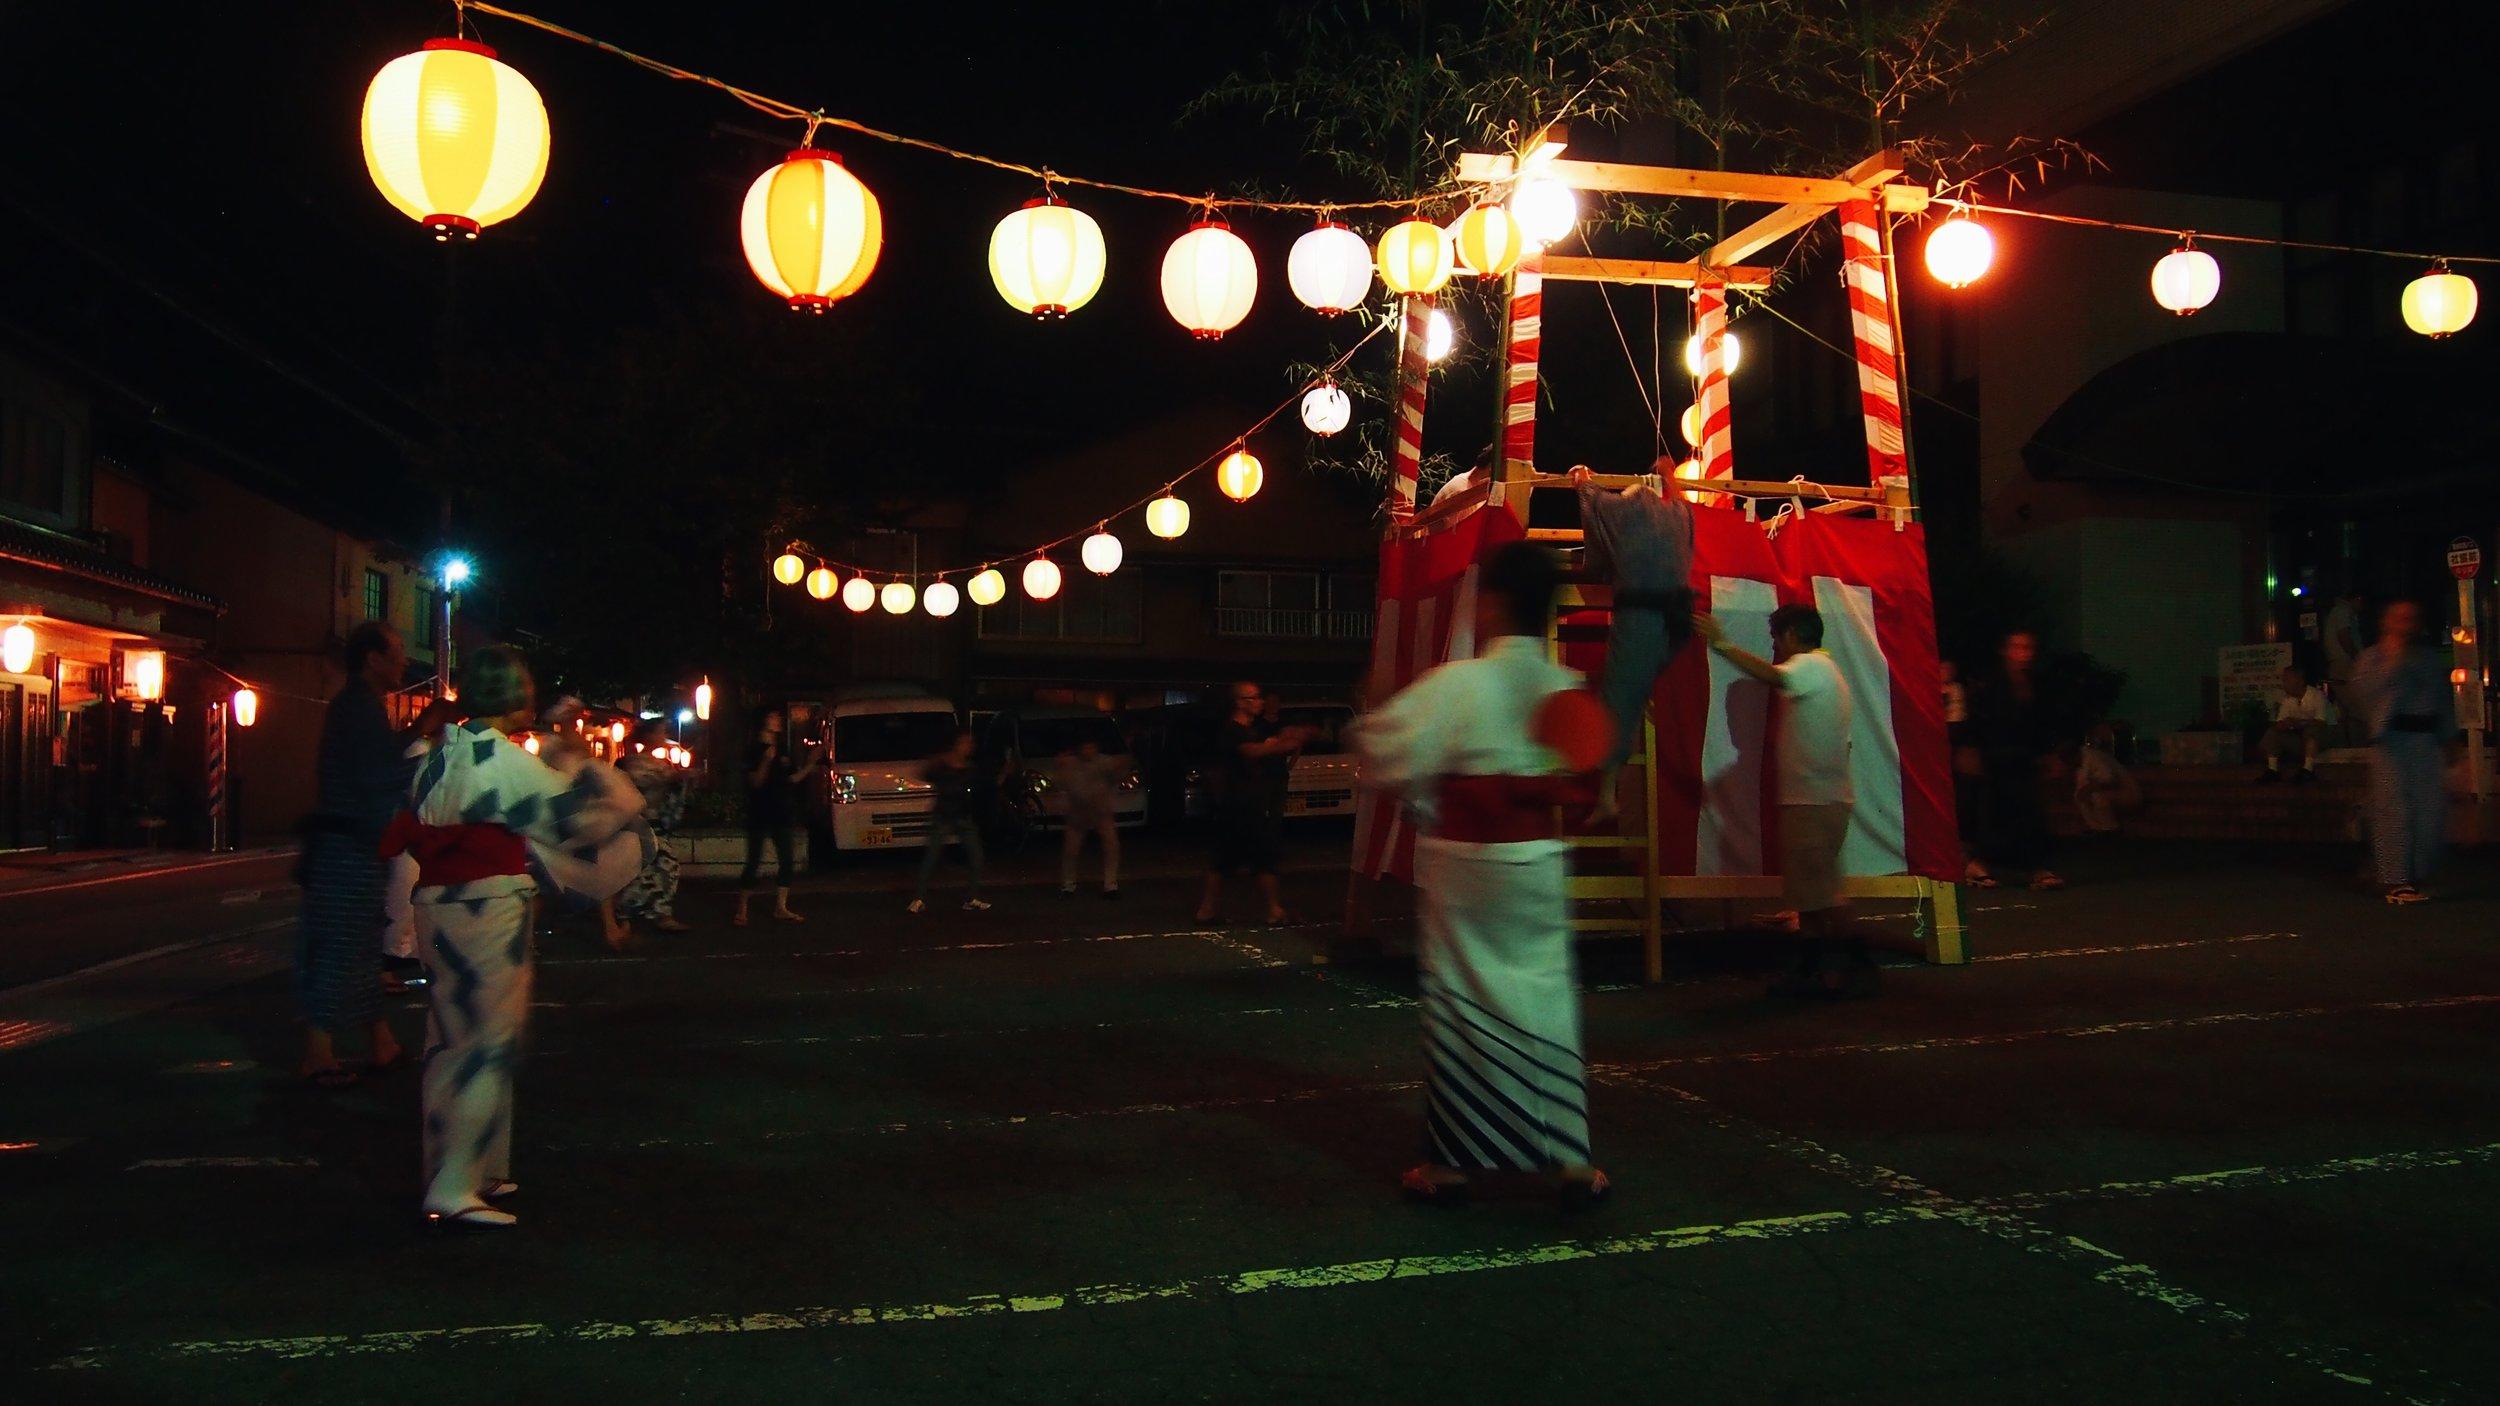 Bon odori in a village in Japan